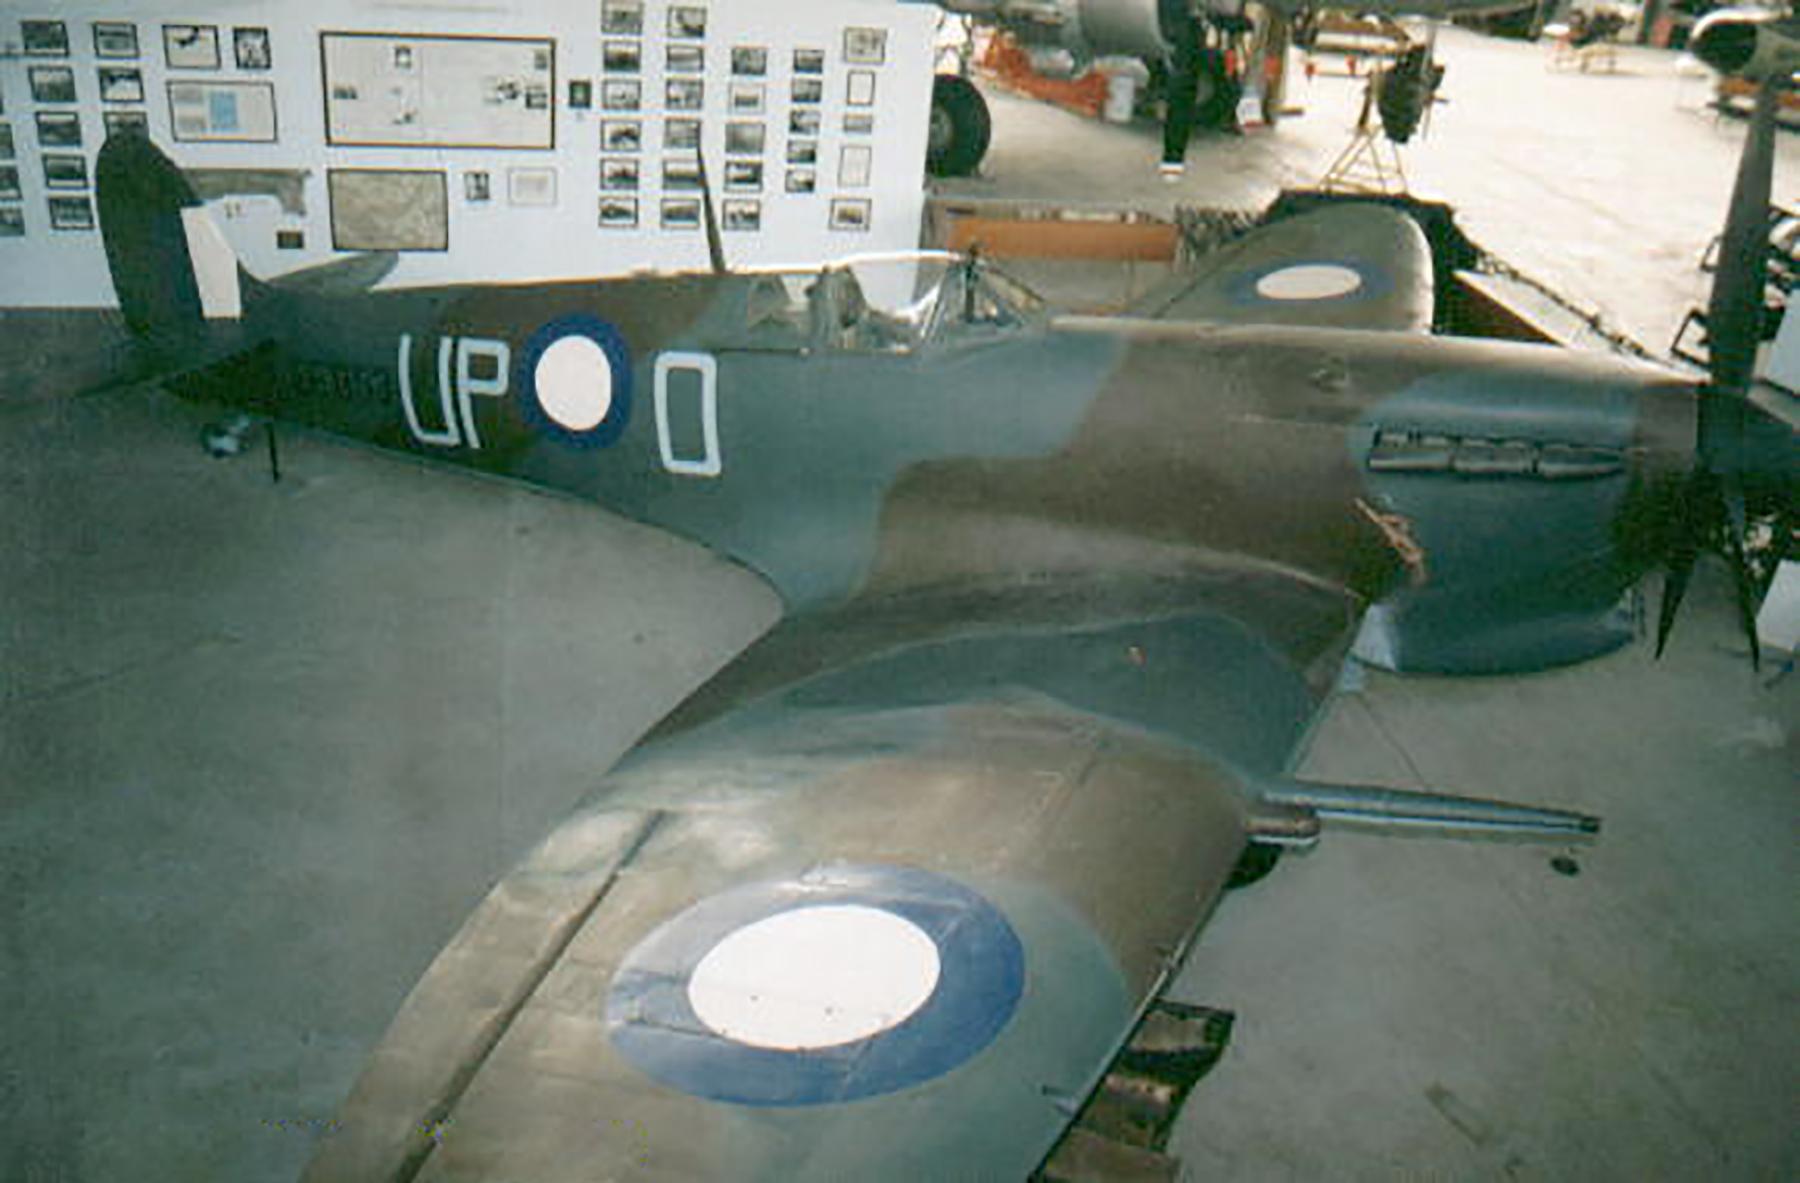 Spitfire RAAF 74Sqn A58 146 UPO presevered 01